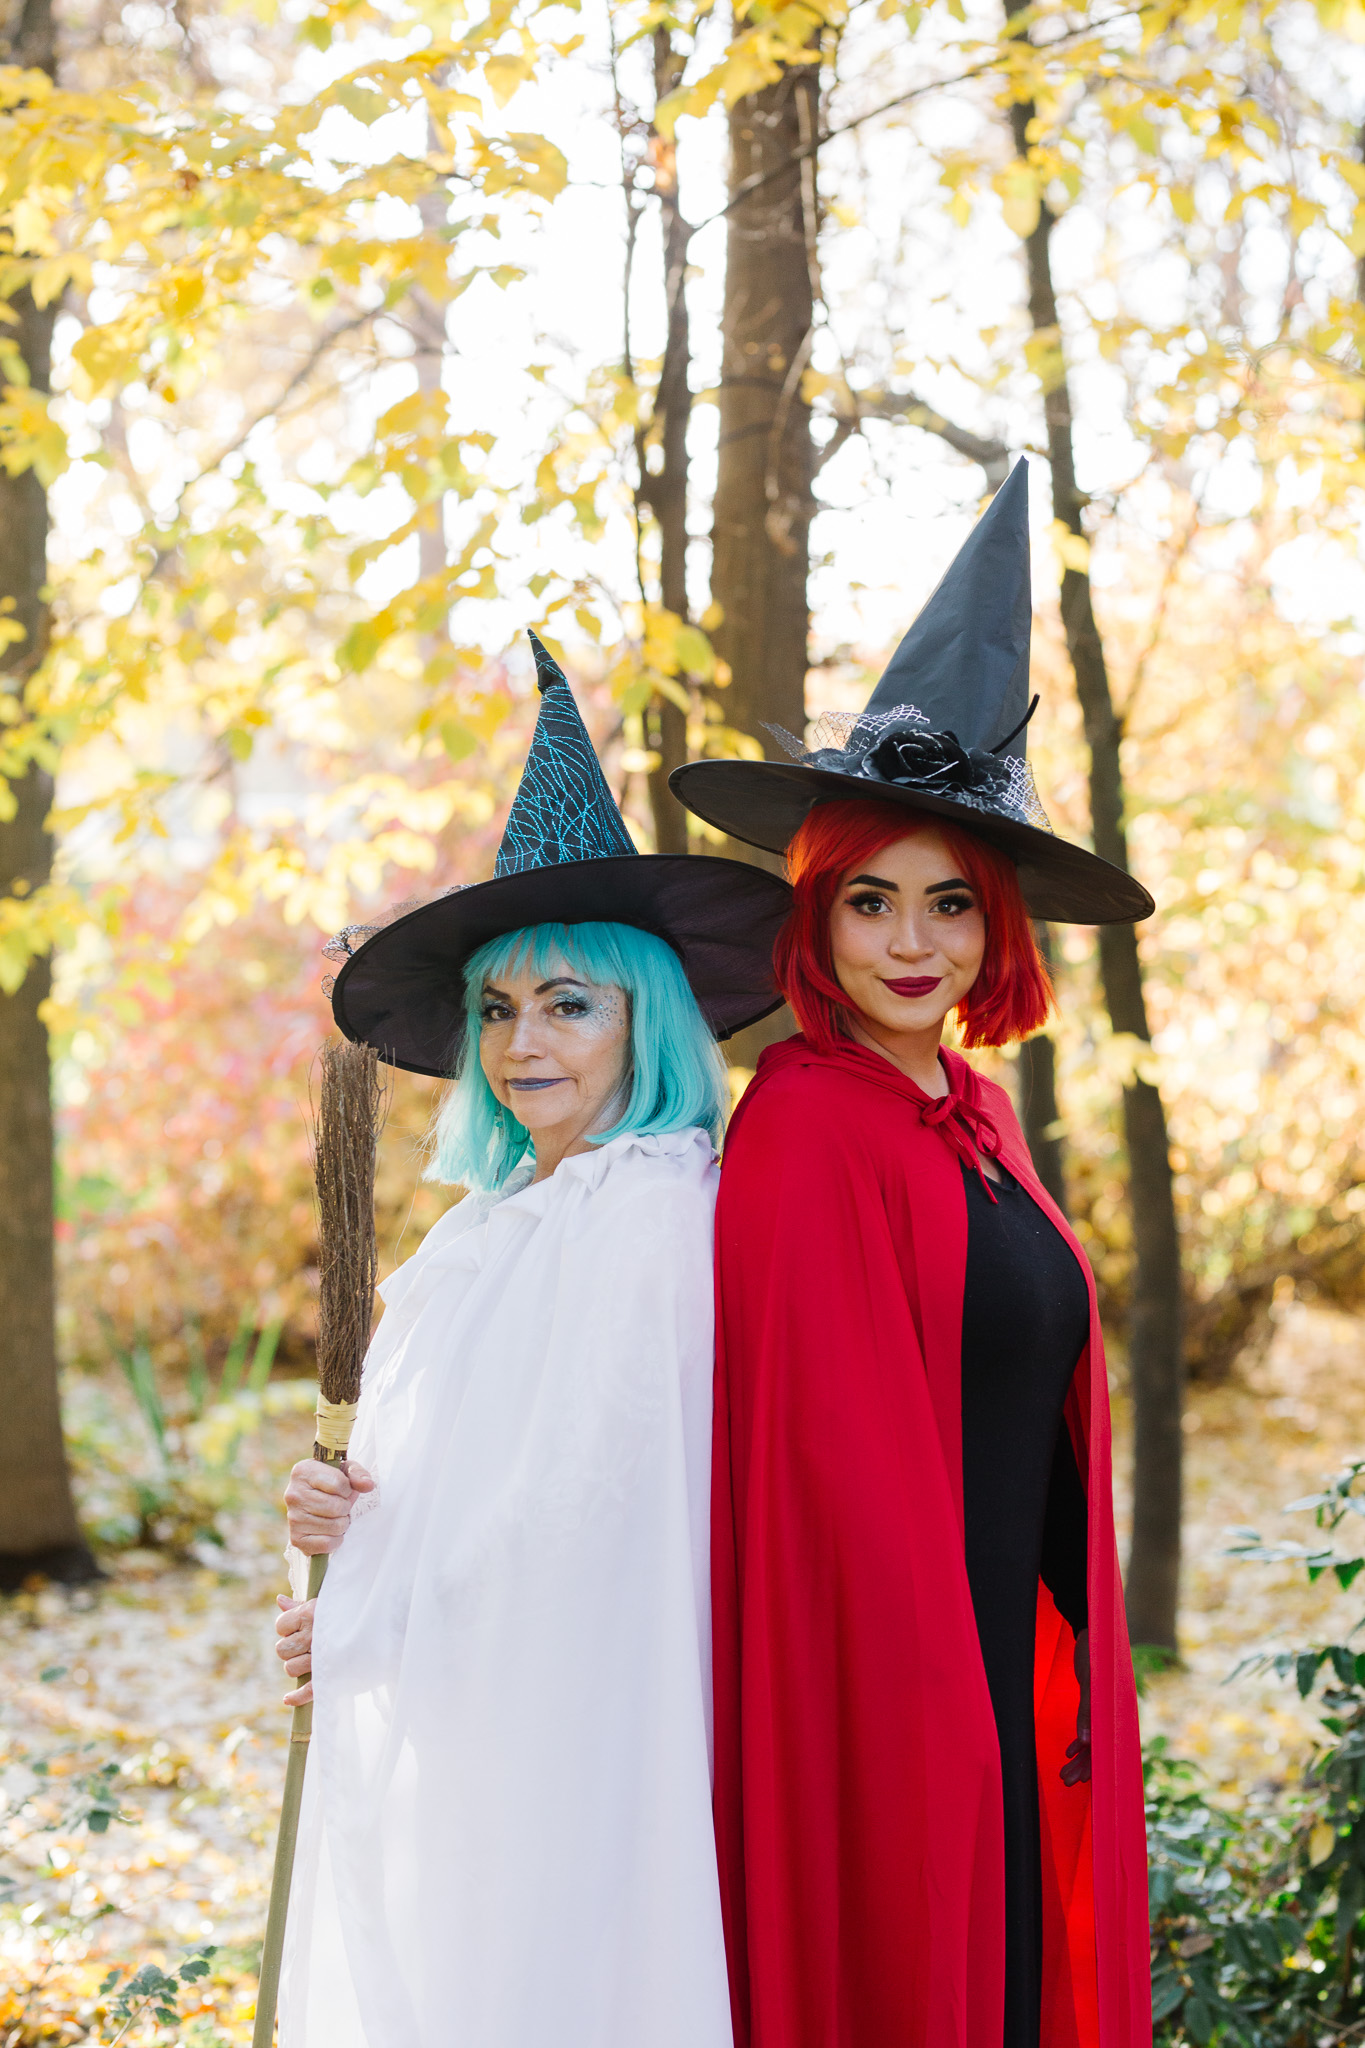 WitchesFire&Ice_JTP2018_012.jpg